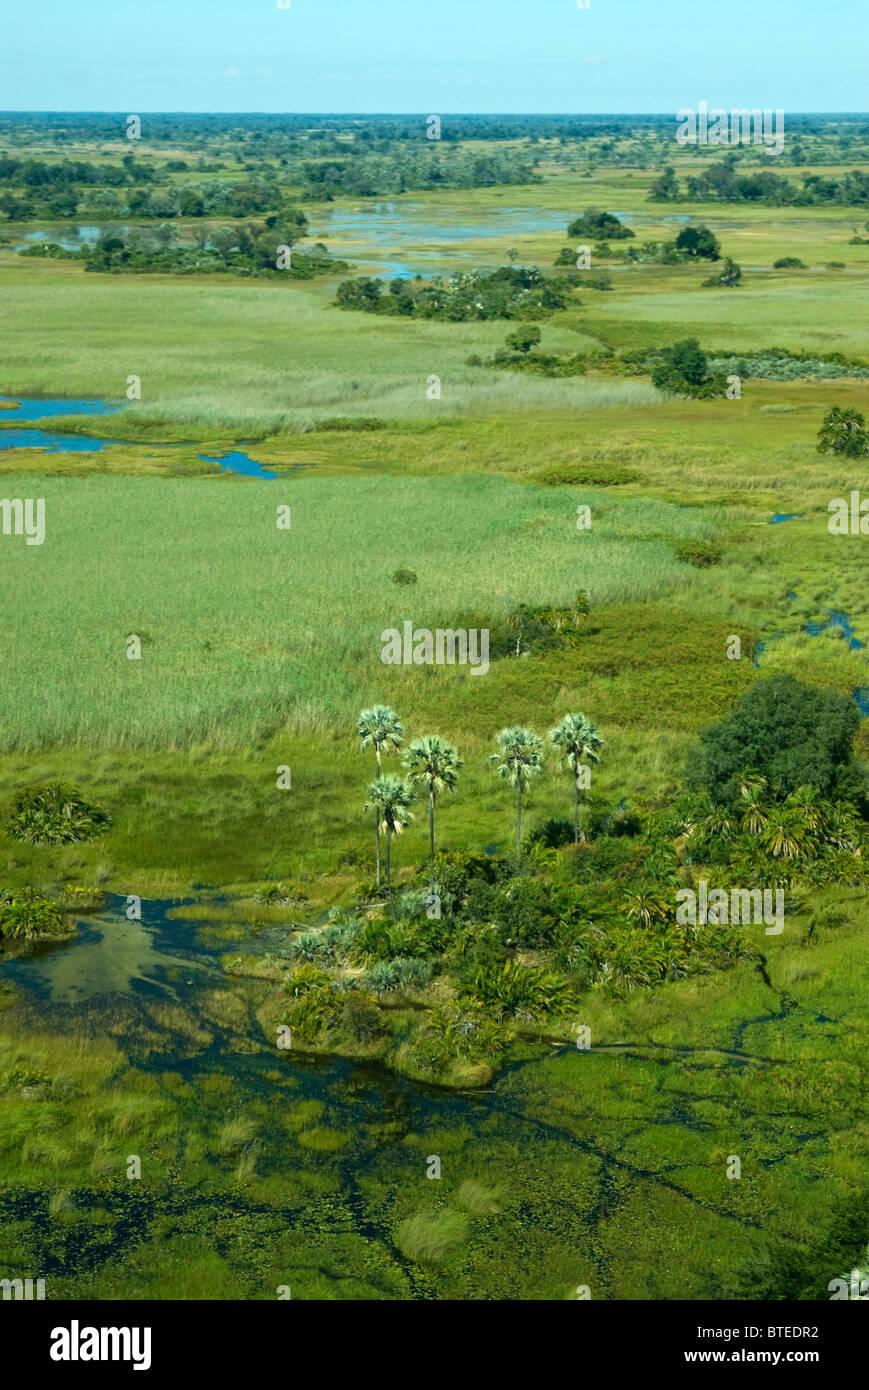 Aerial scenic view of the Okavango delta - Stock Image